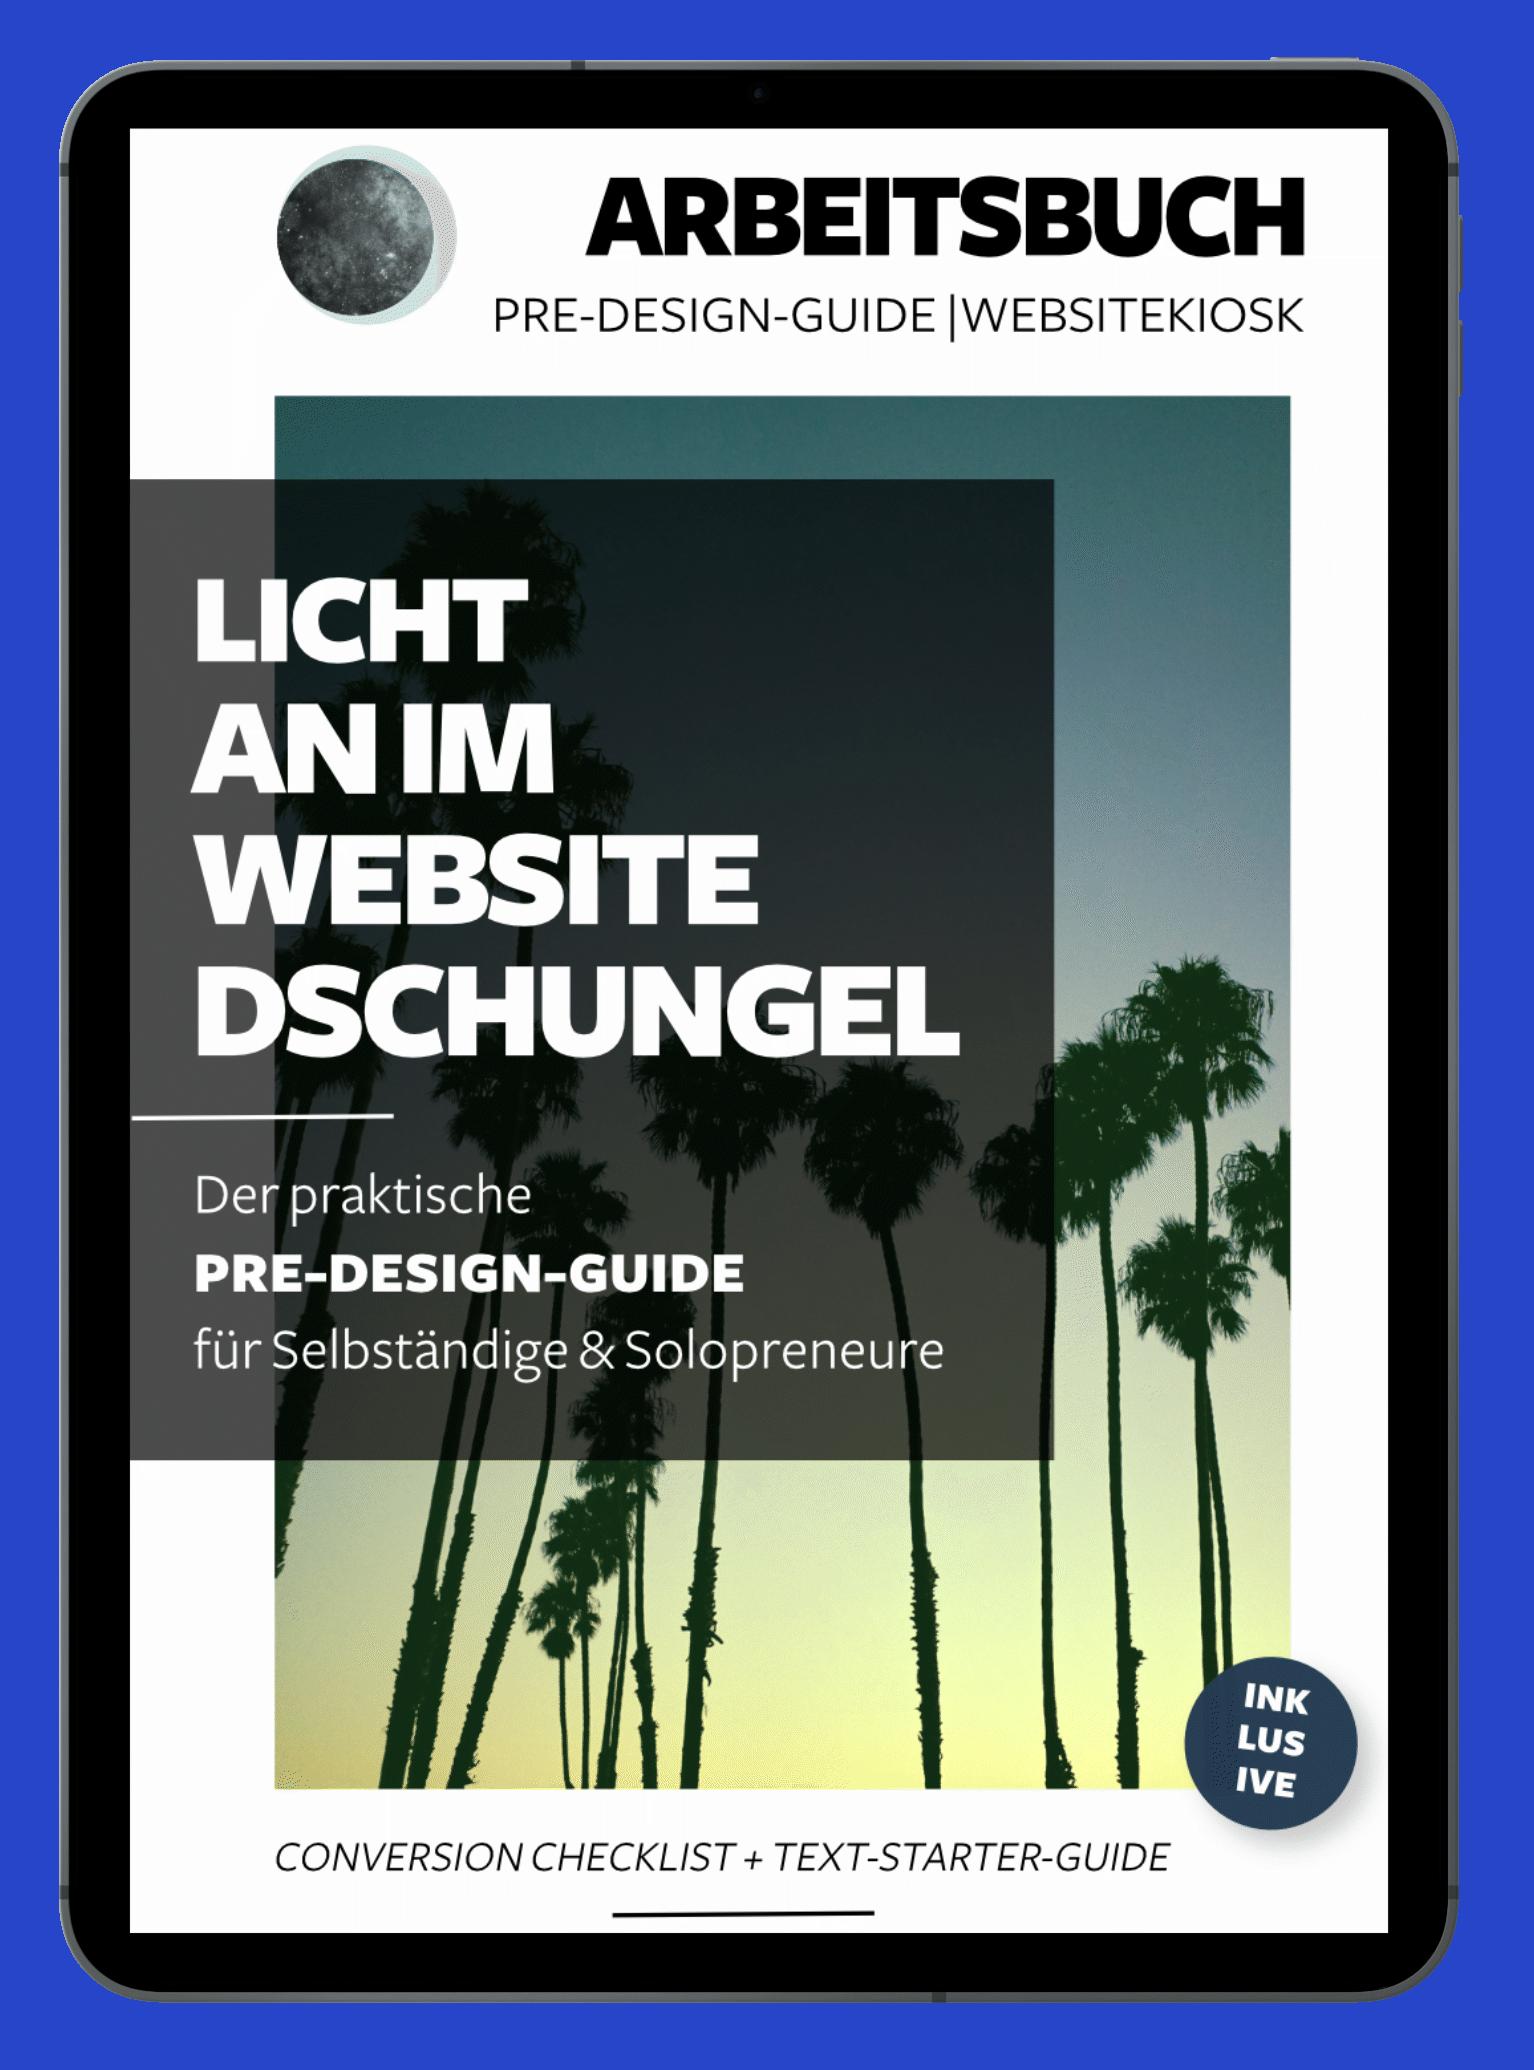 pre design guide ipad websitekiosk 2.png